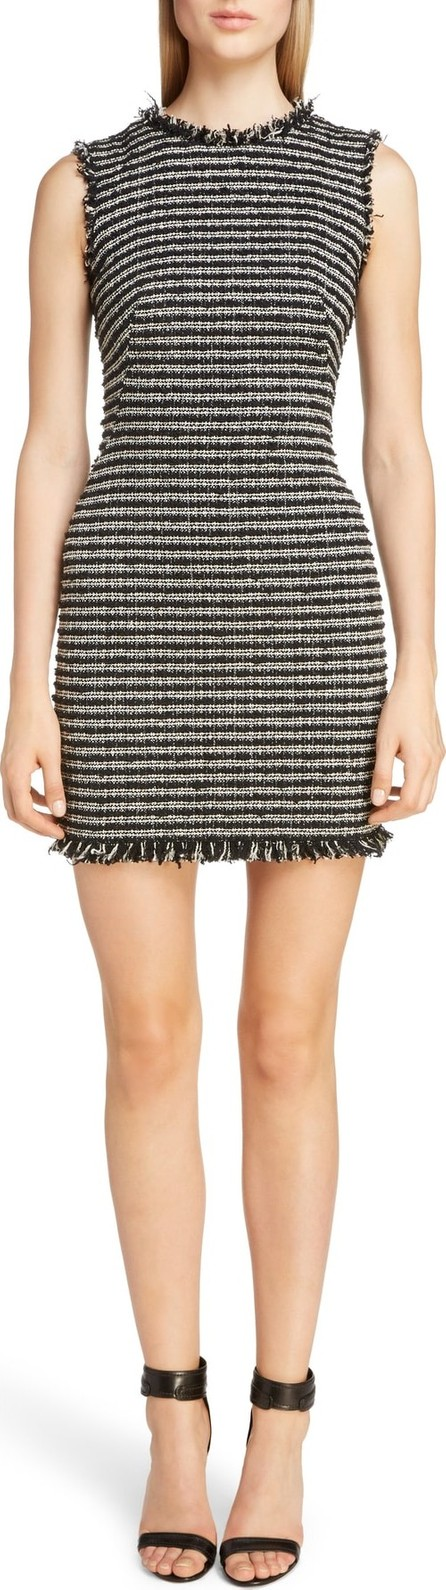 Alexander McQueen Frayed Tweed Minidress